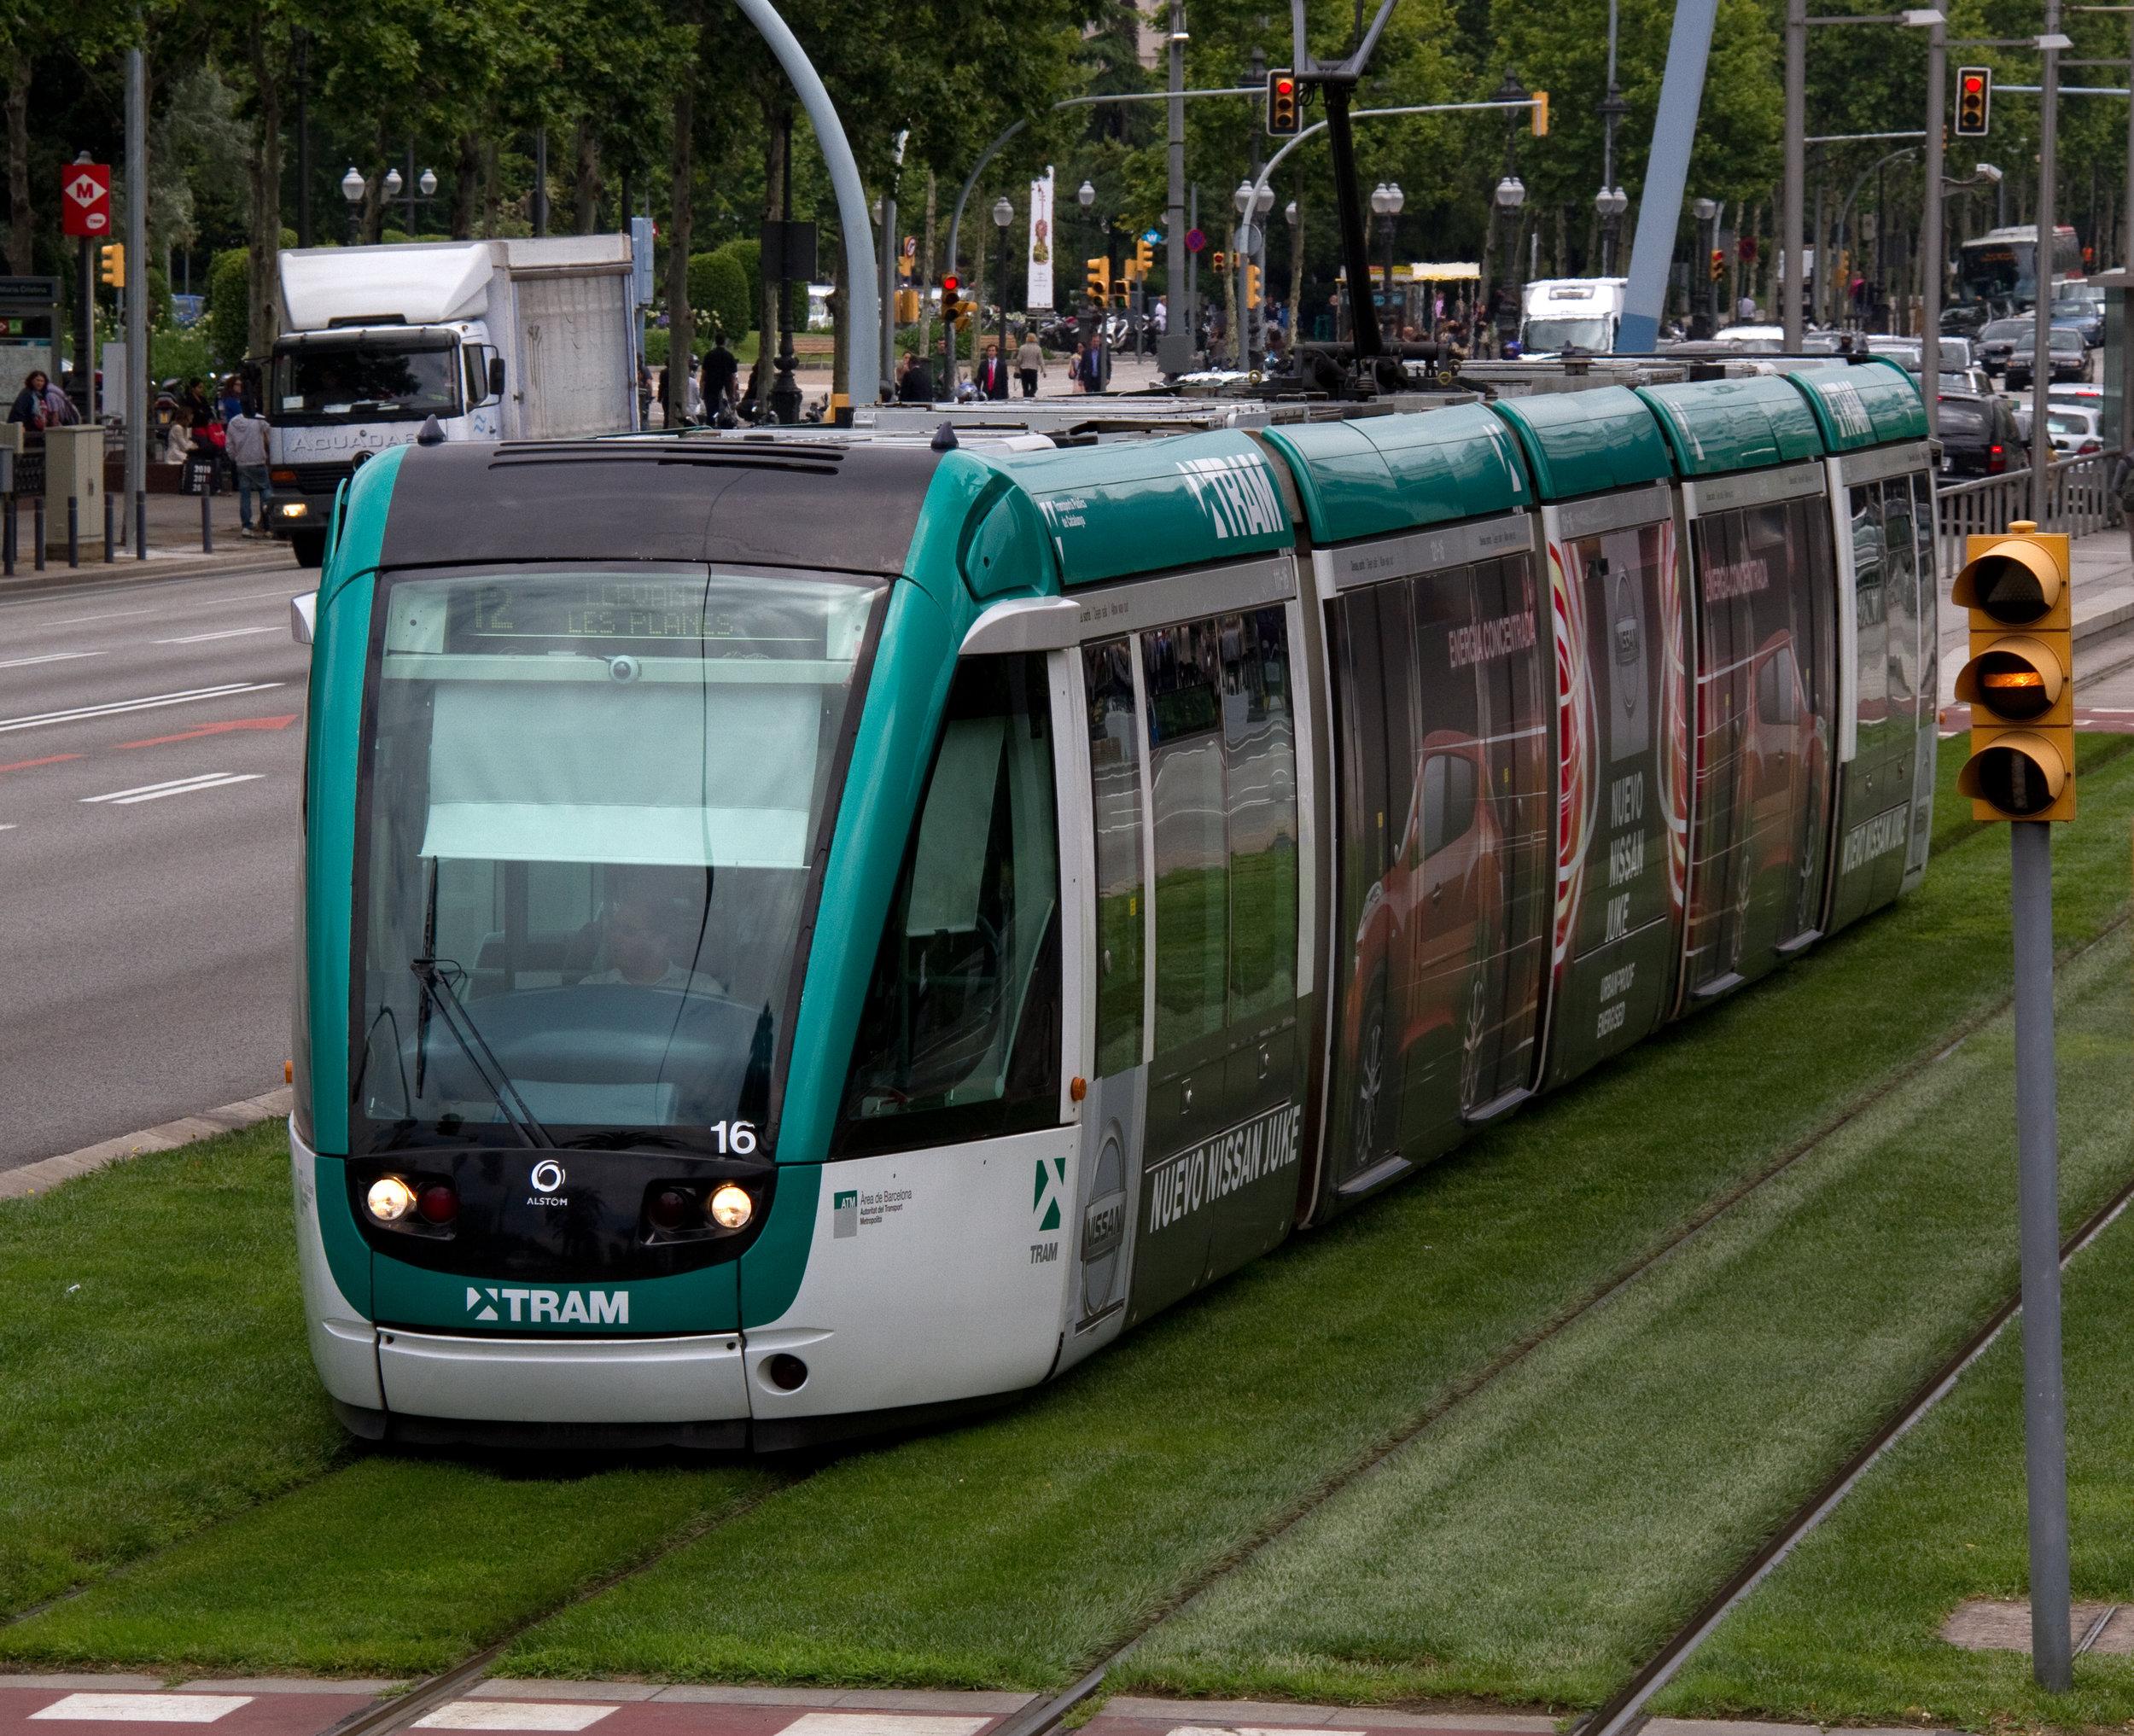 Tramvaj Alstom Citadis v ulicích Barcelony. (foto: Tony Hisgett; zdroj: Wikipedia.org)